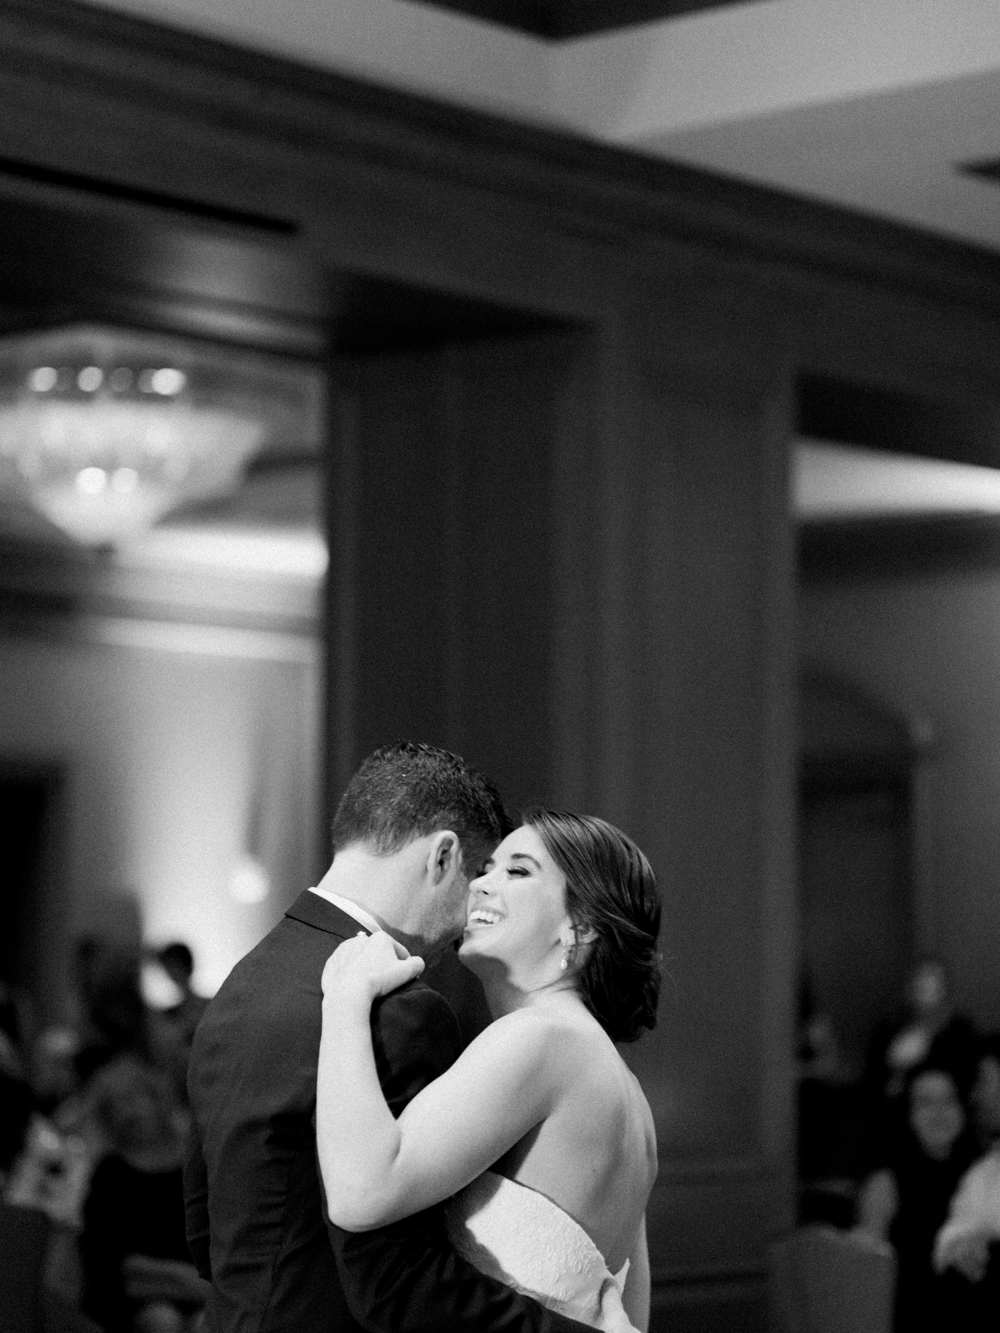 Christine Gosch - destination film photographer - houston wedding photographer - fine art film photographer - elopement photographer - destination wedding - understated wedding - simple beautiful wedding photography-11.jpg